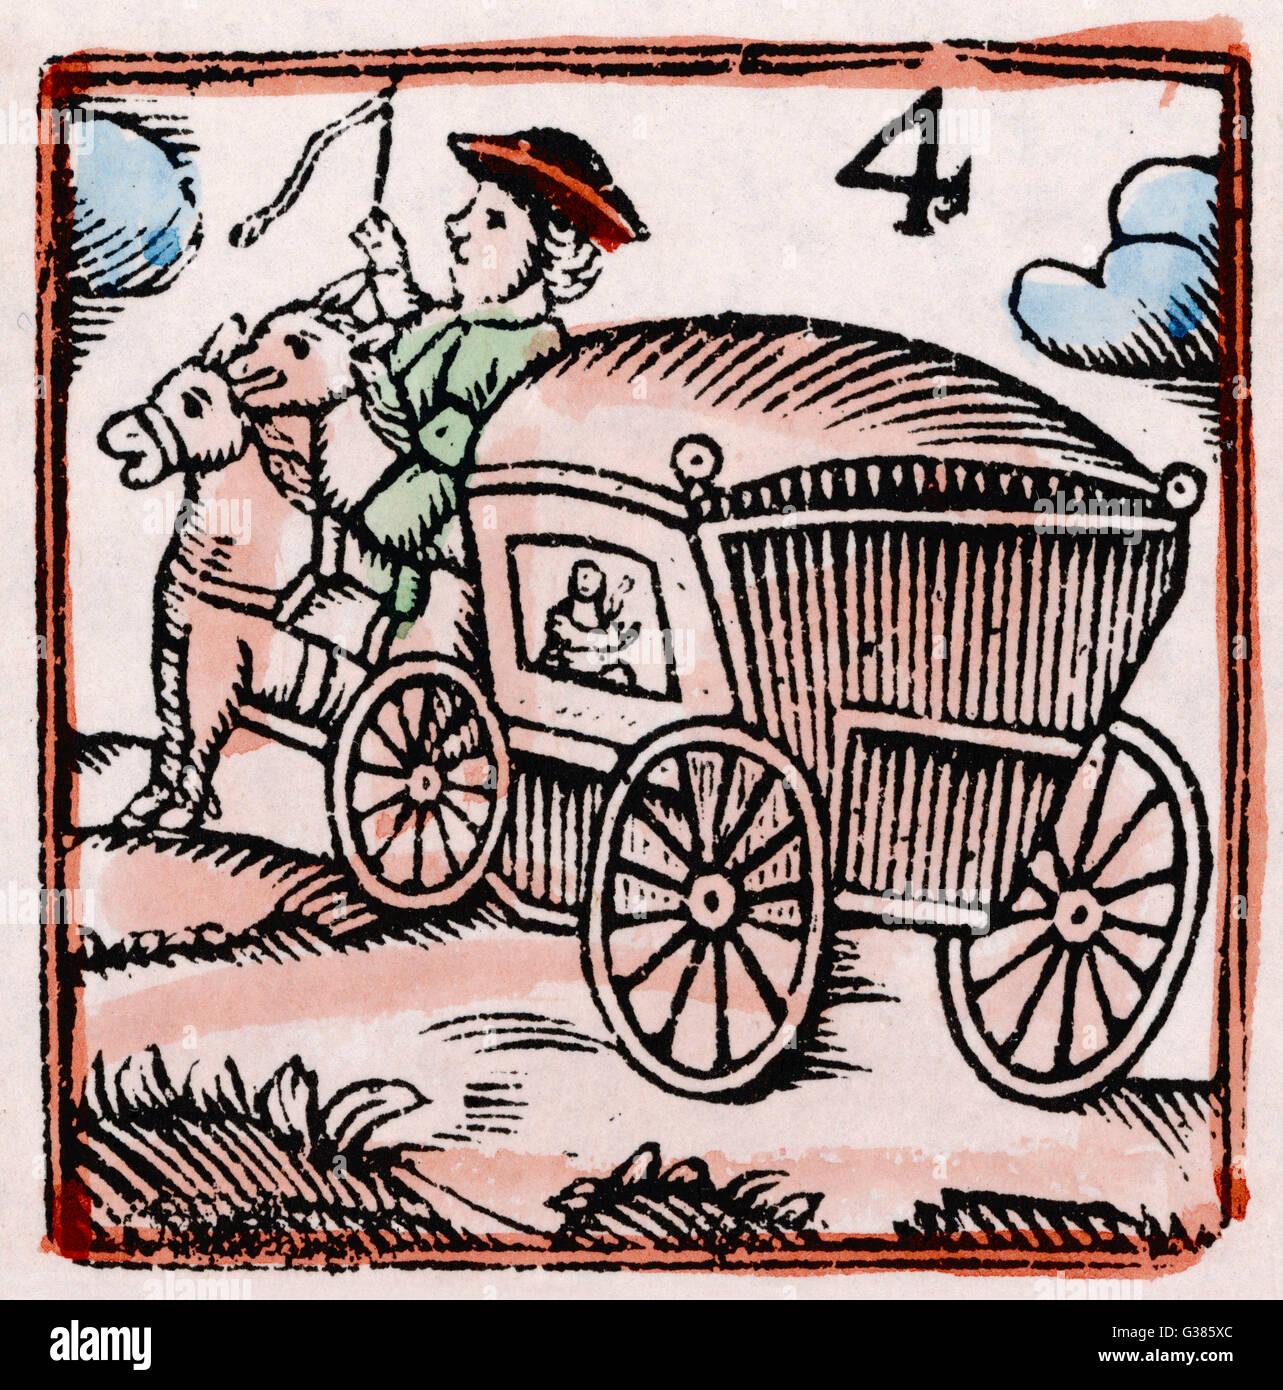 A coachman          Date: 17th century - Stock Image